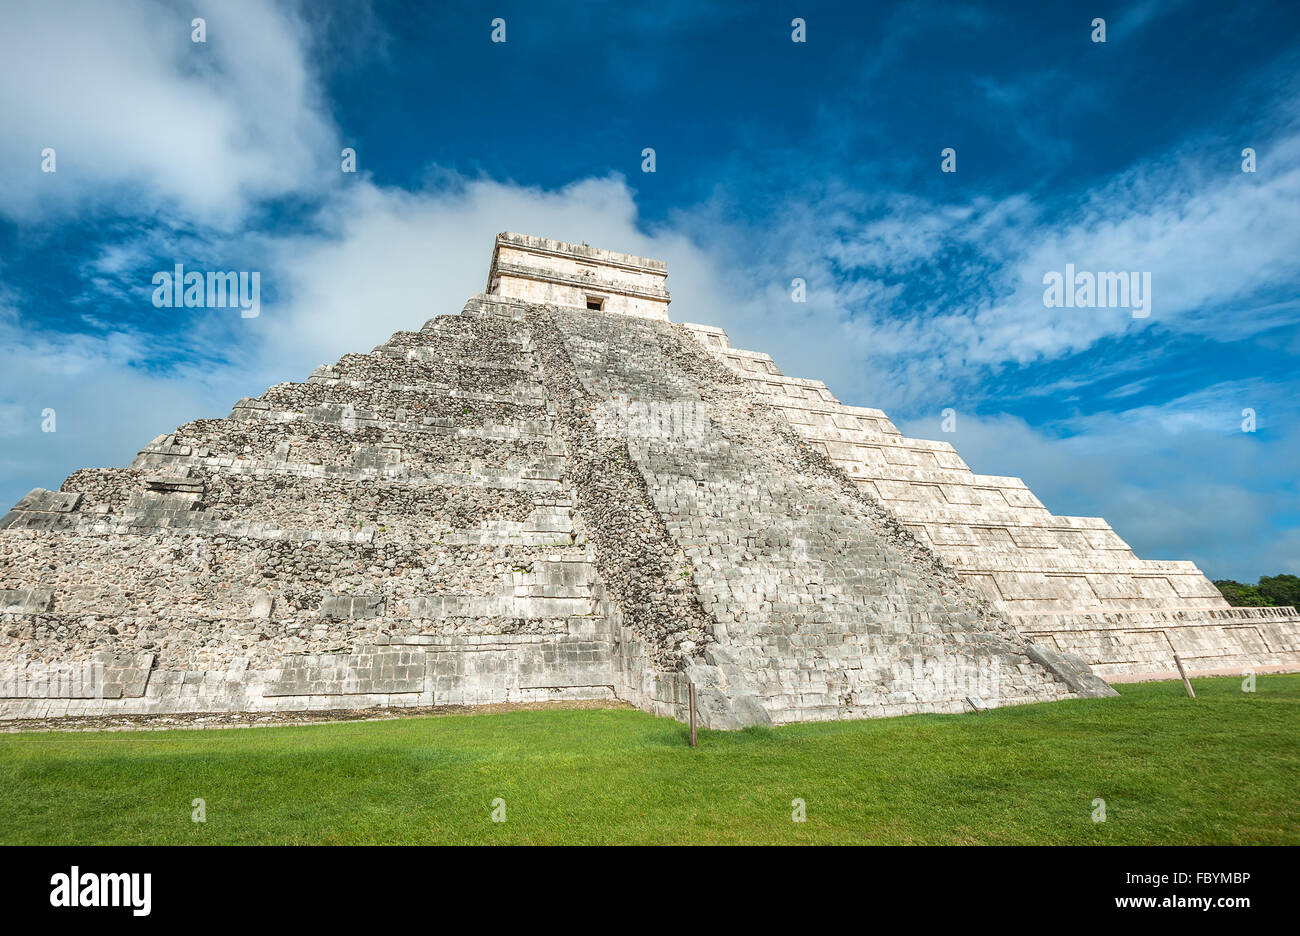 El Castillo or Temple of Kukulkan pyramid, Chichen Itza, Yucatan, Mexico - Stock Image